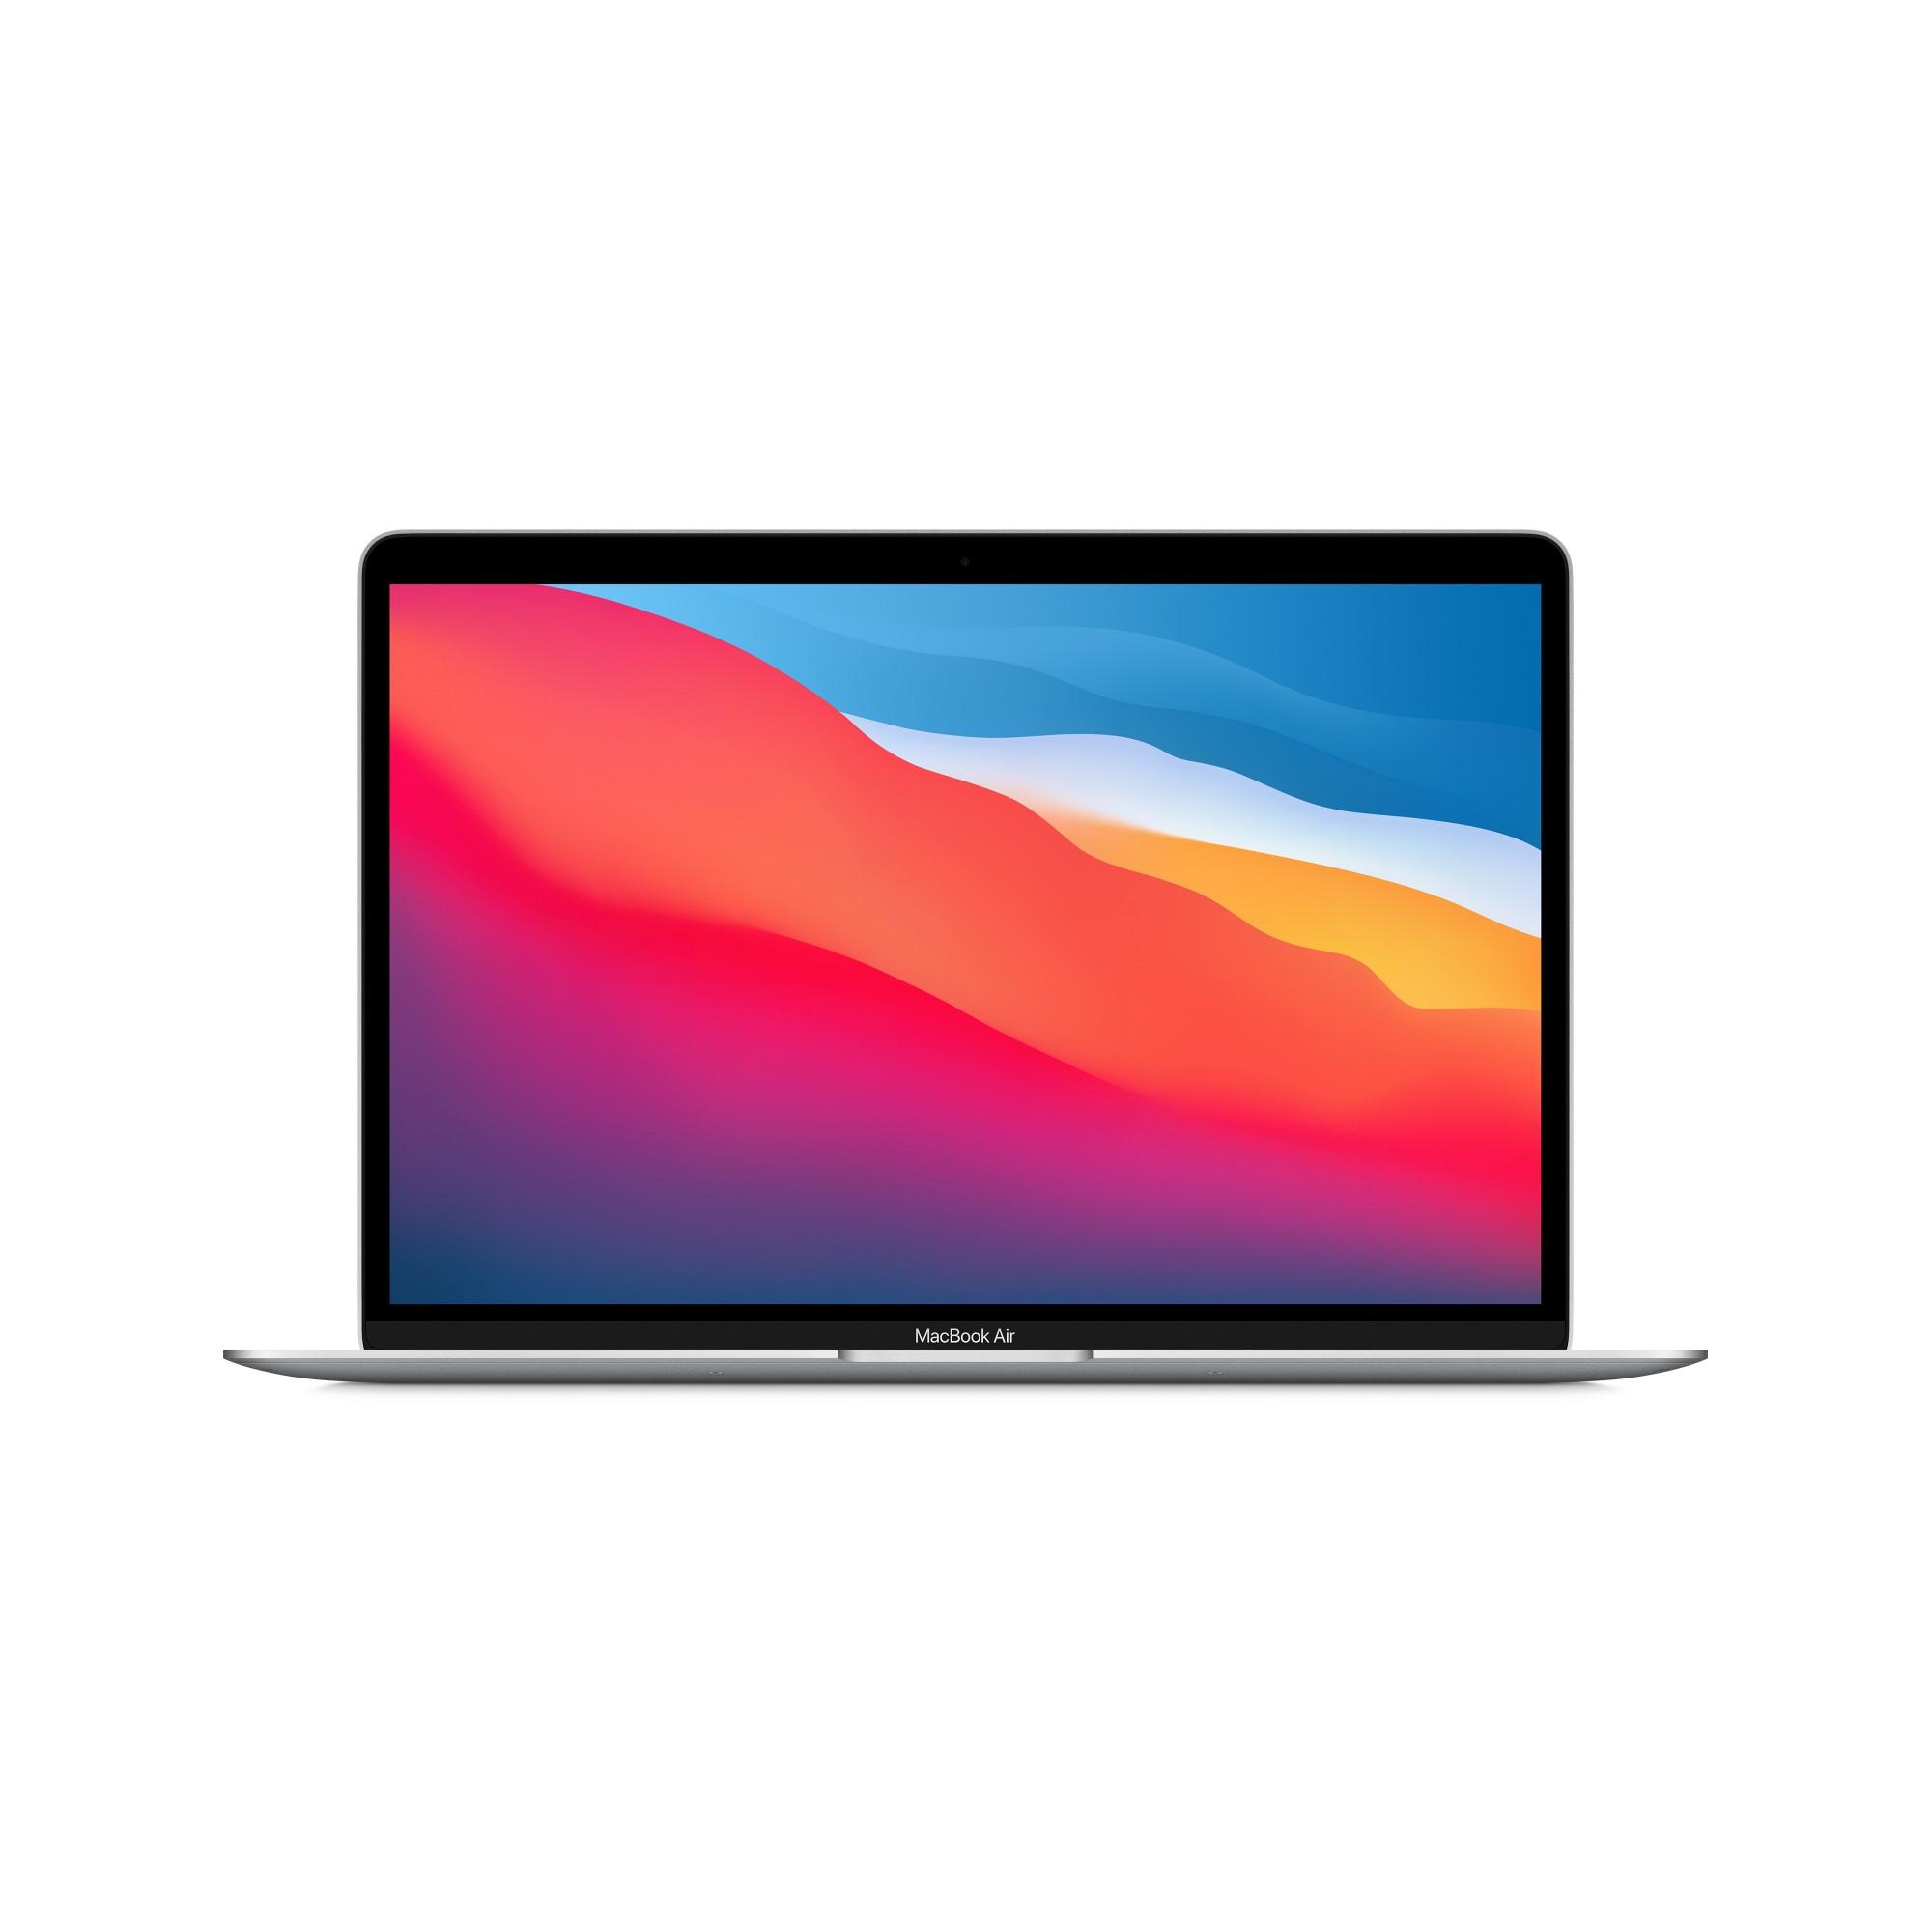 Apple MacBook Air 13-inch : M1 chip with 8-core CPU and 8-core GPU, 512GB - Silver (2020)